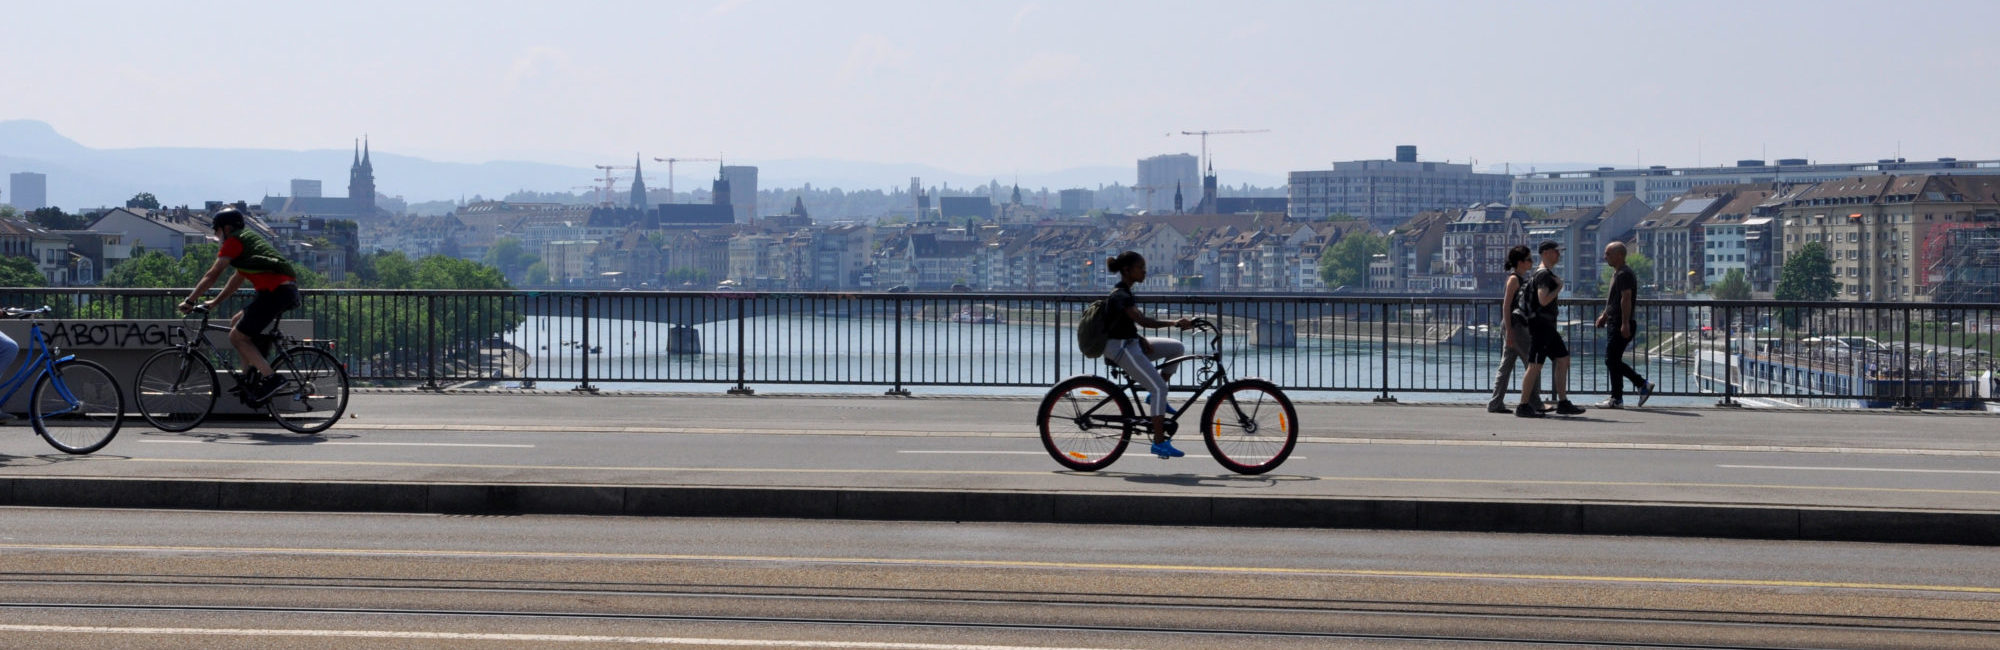 Basel Dreirosenbrücke